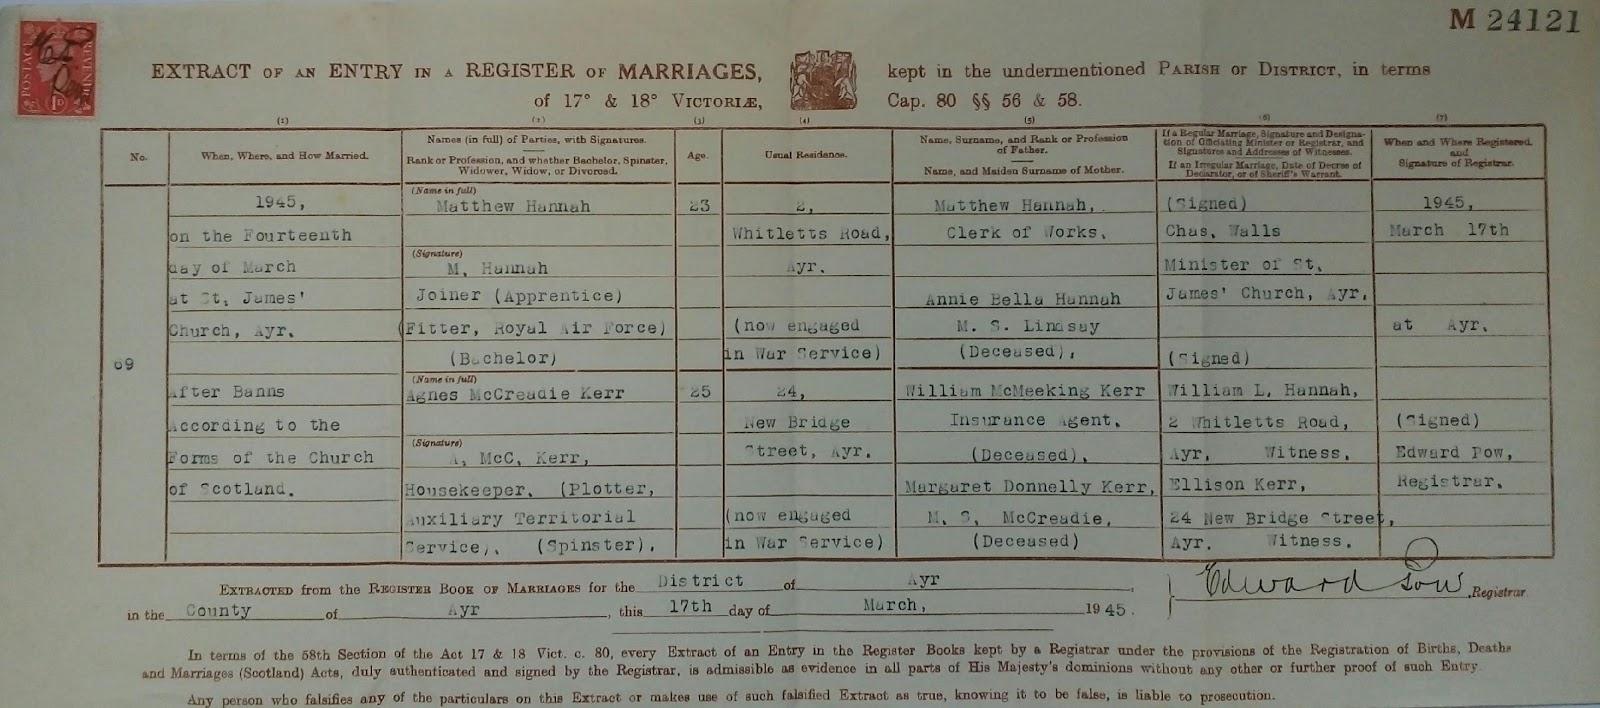 C:\Users\Main user\Pictures\Matt Hannah's Family\Hannah Certificates\Matthew Hannah and Agnes Kerr Marriage Certificate.jpg